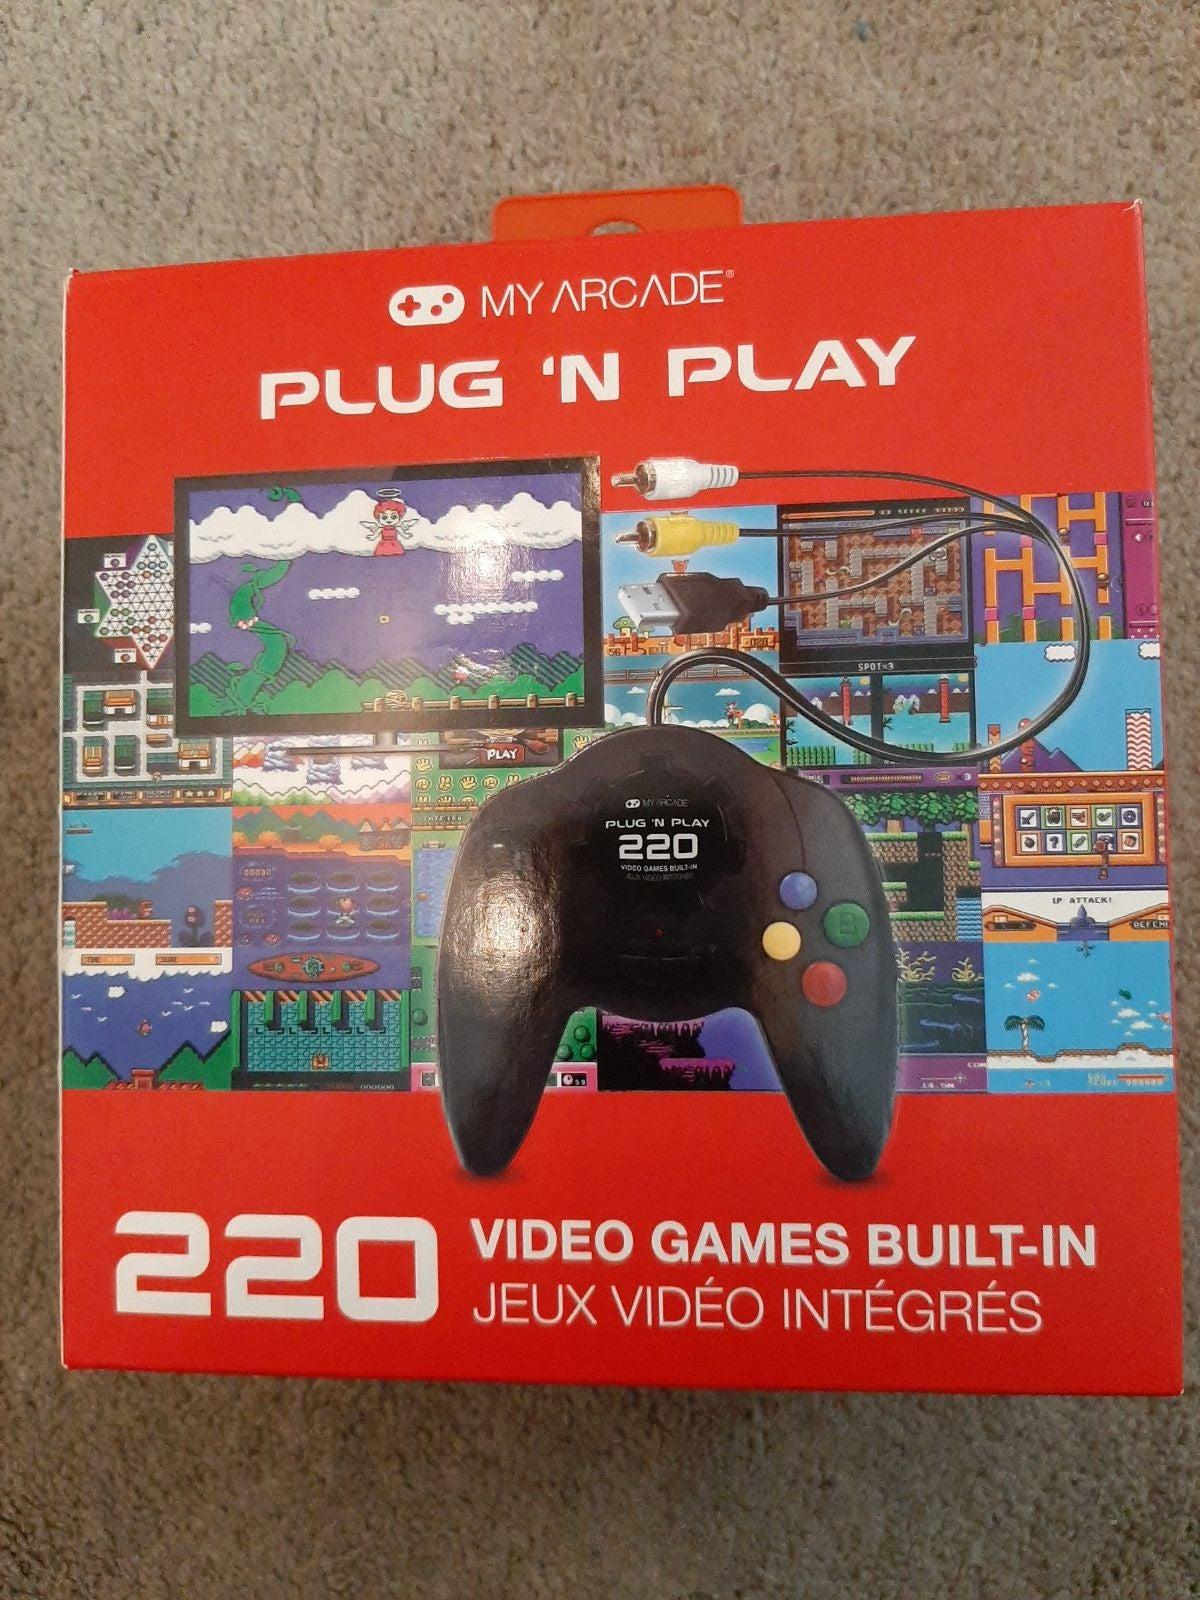 My Arcade Plug N Play 220 Video Games